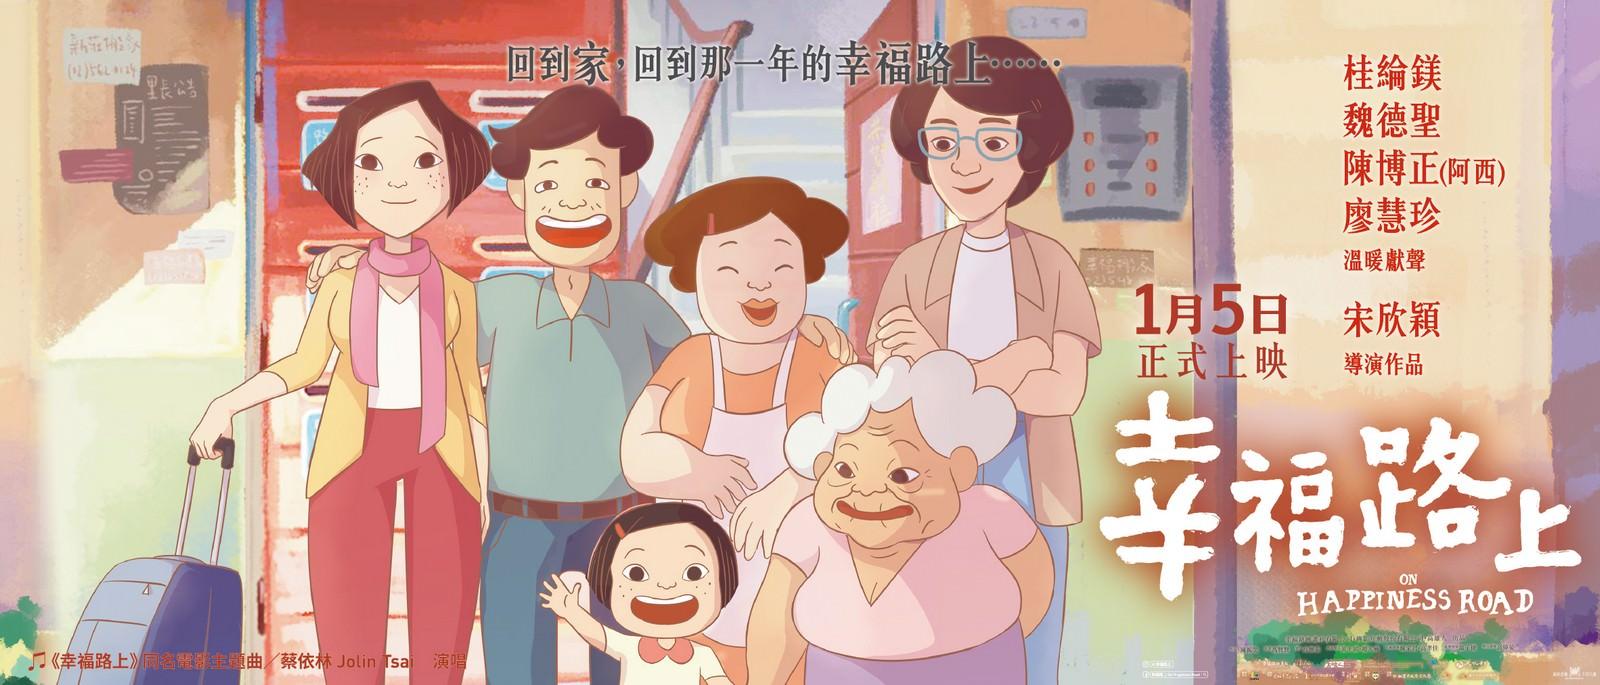 Movie, 幸福路上 / 幸福路上(台灣, 2017年) / On Happiness Road(英文), 電影海報, 台灣, 橫版